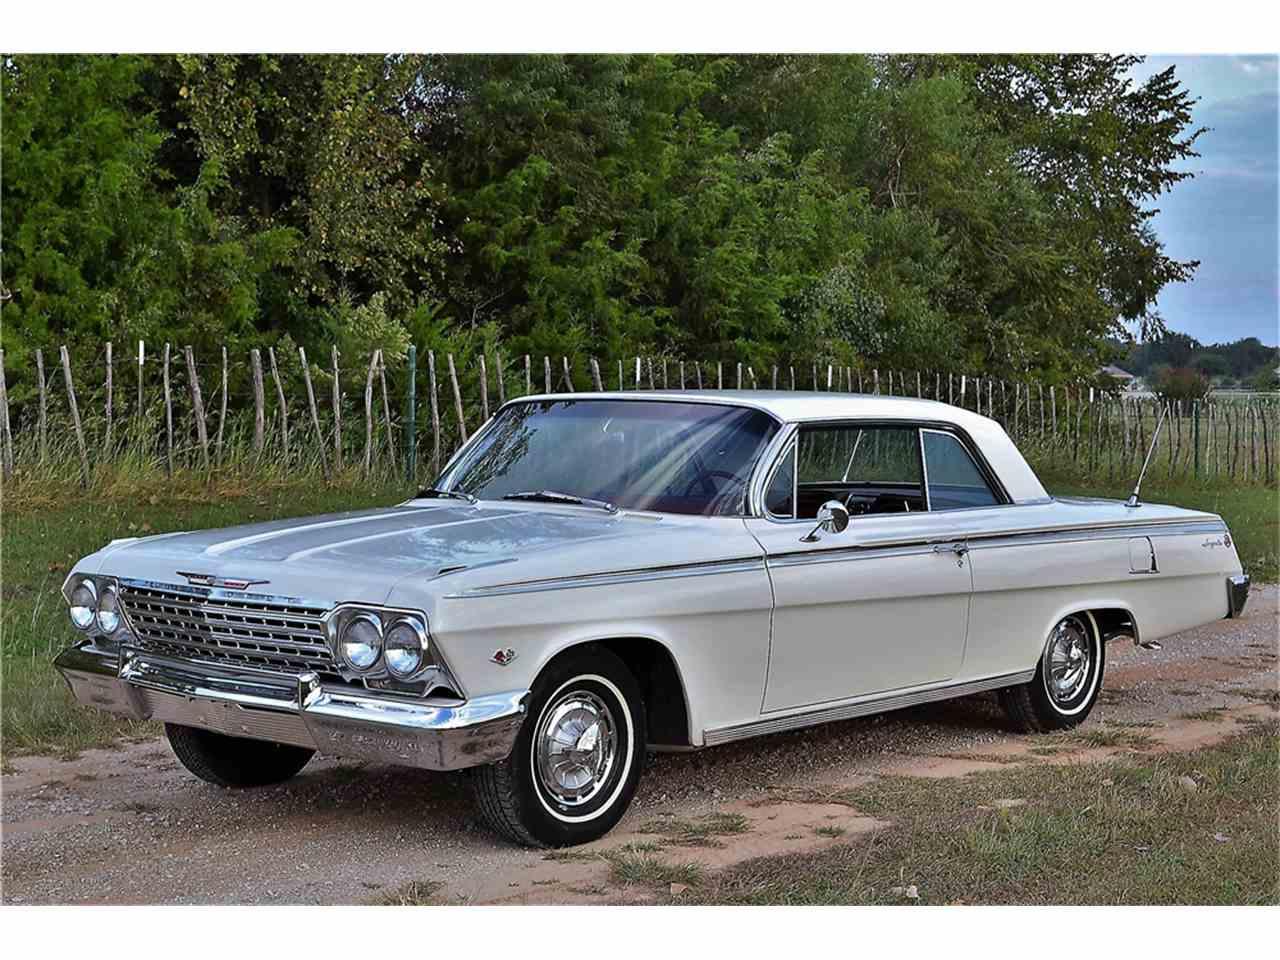 1962 chevrolet impala ss for sale cc 1029485. Black Bedroom Furniture Sets. Home Design Ideas